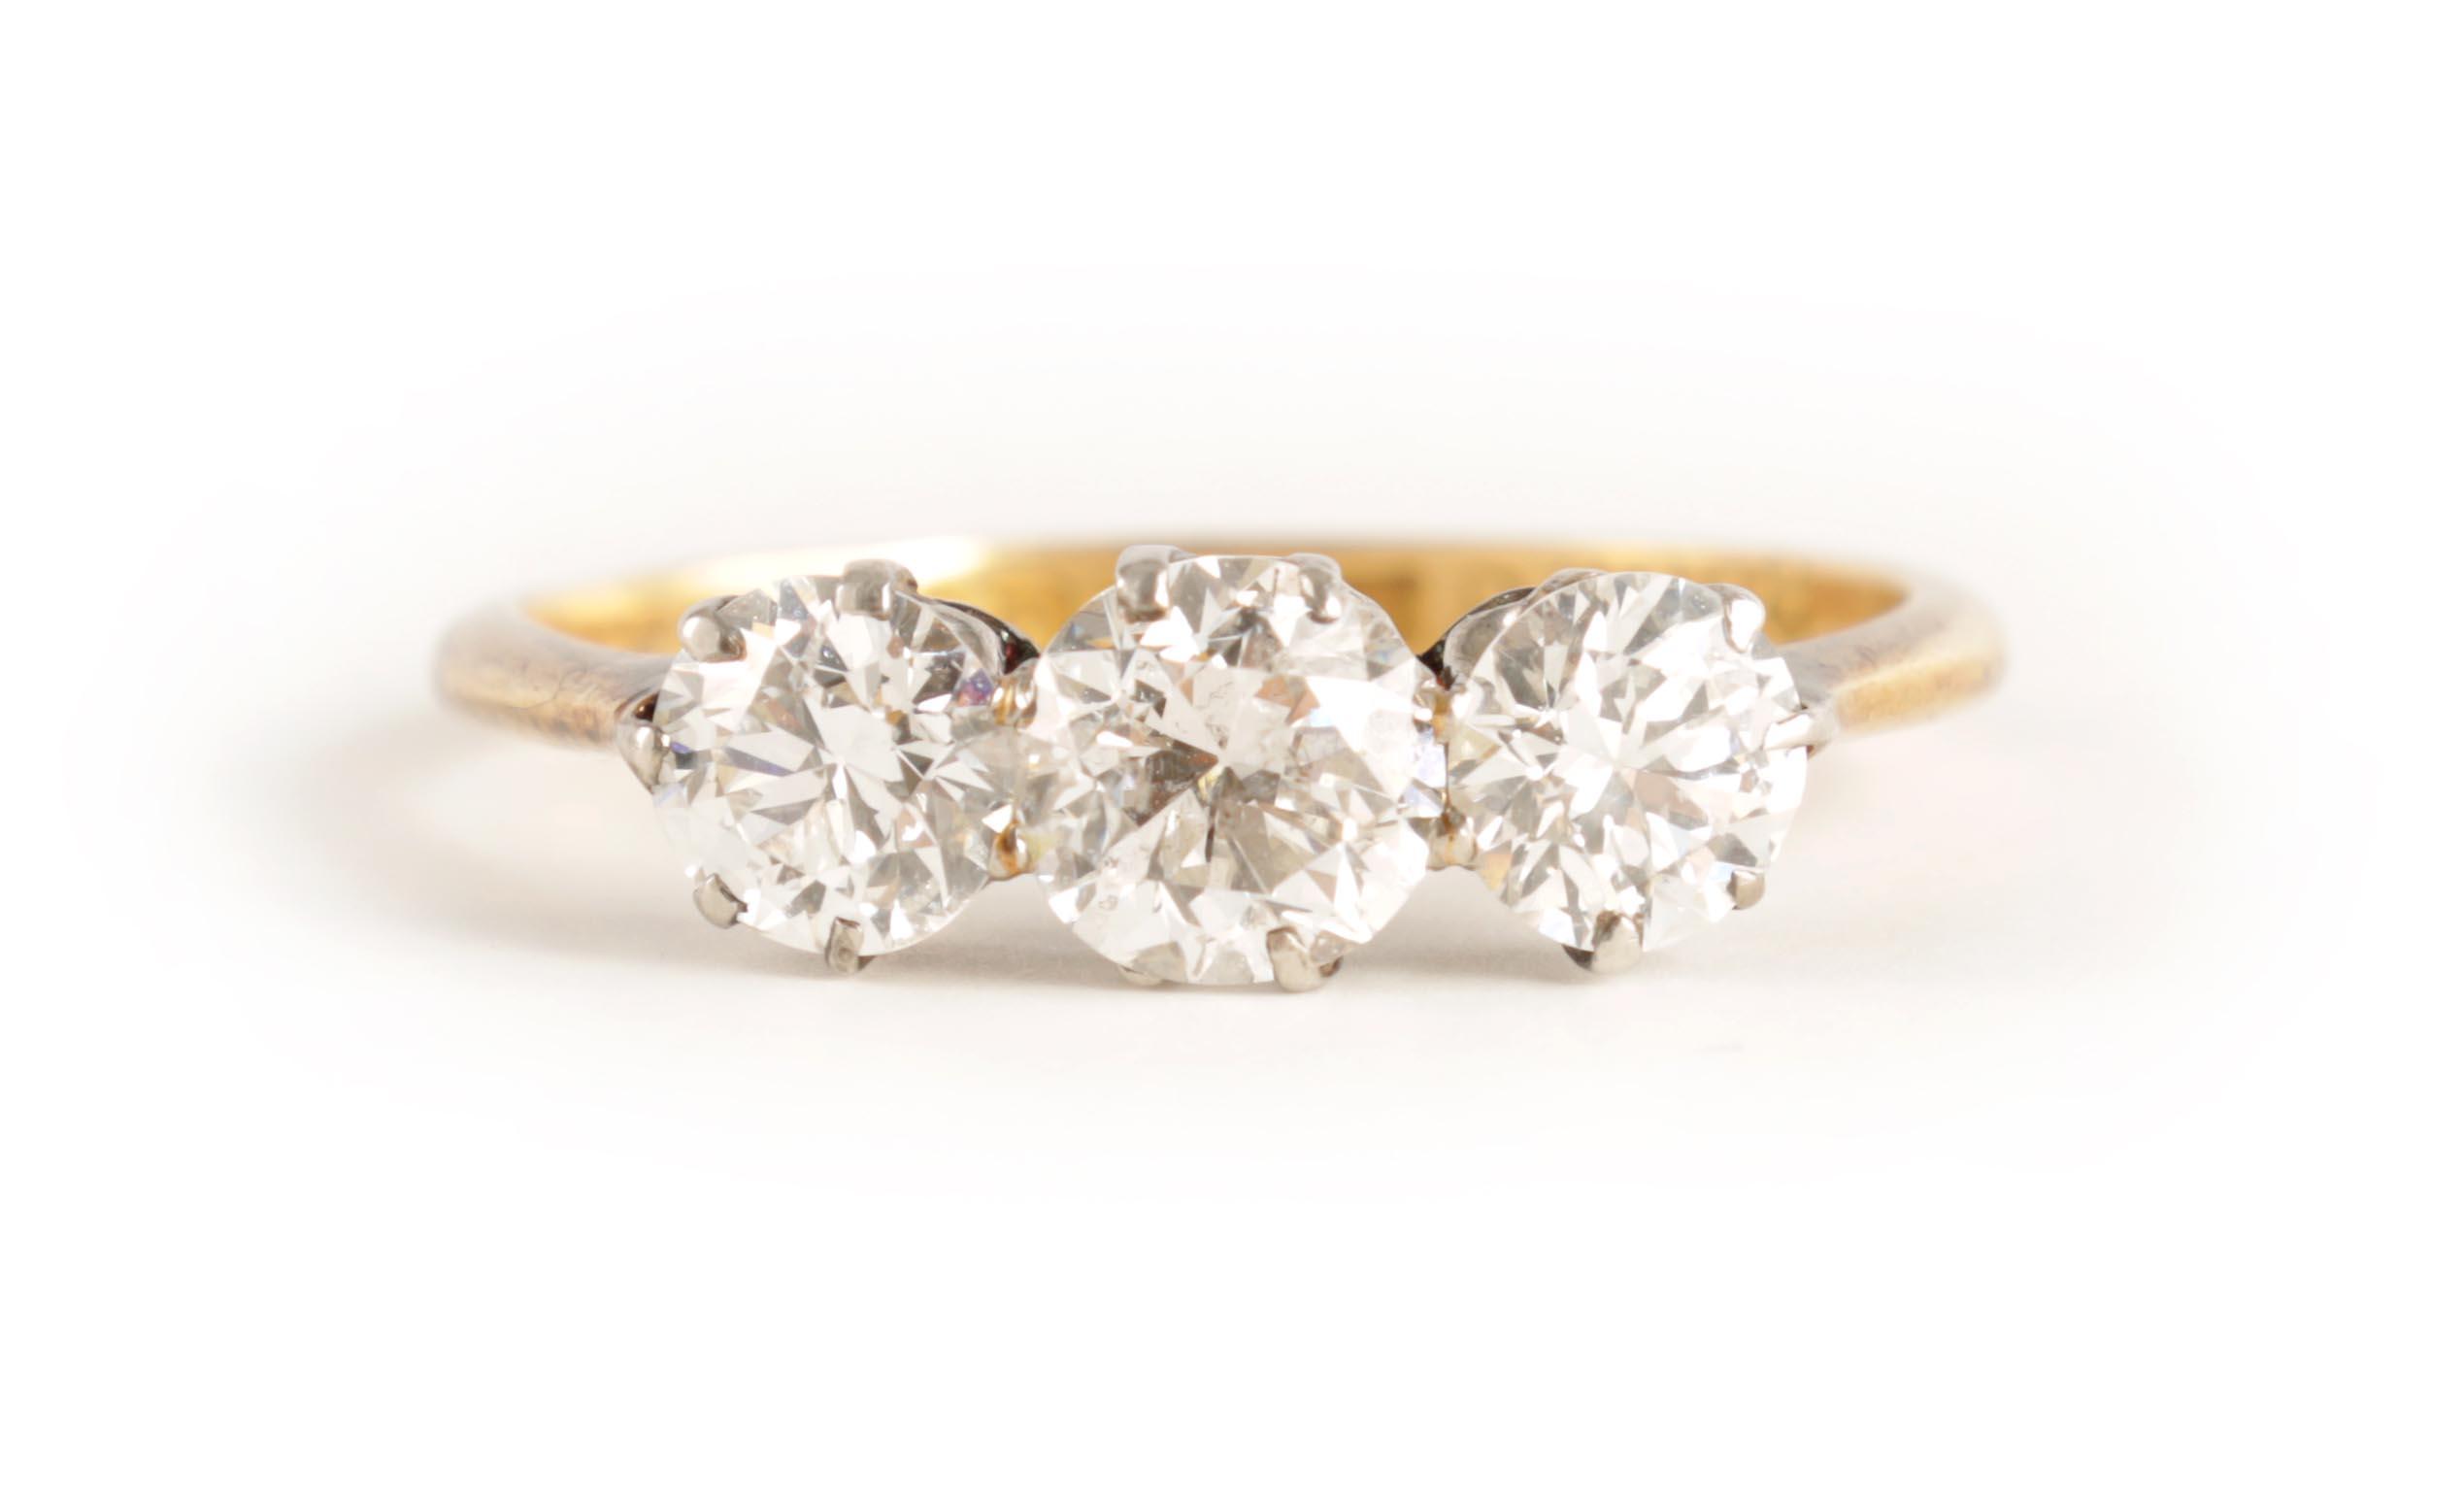 A LADIES THREE STONE DIAMOND RING on an 18ct gold shank, app. 1.2cts. of diamonds, clarity SI2,